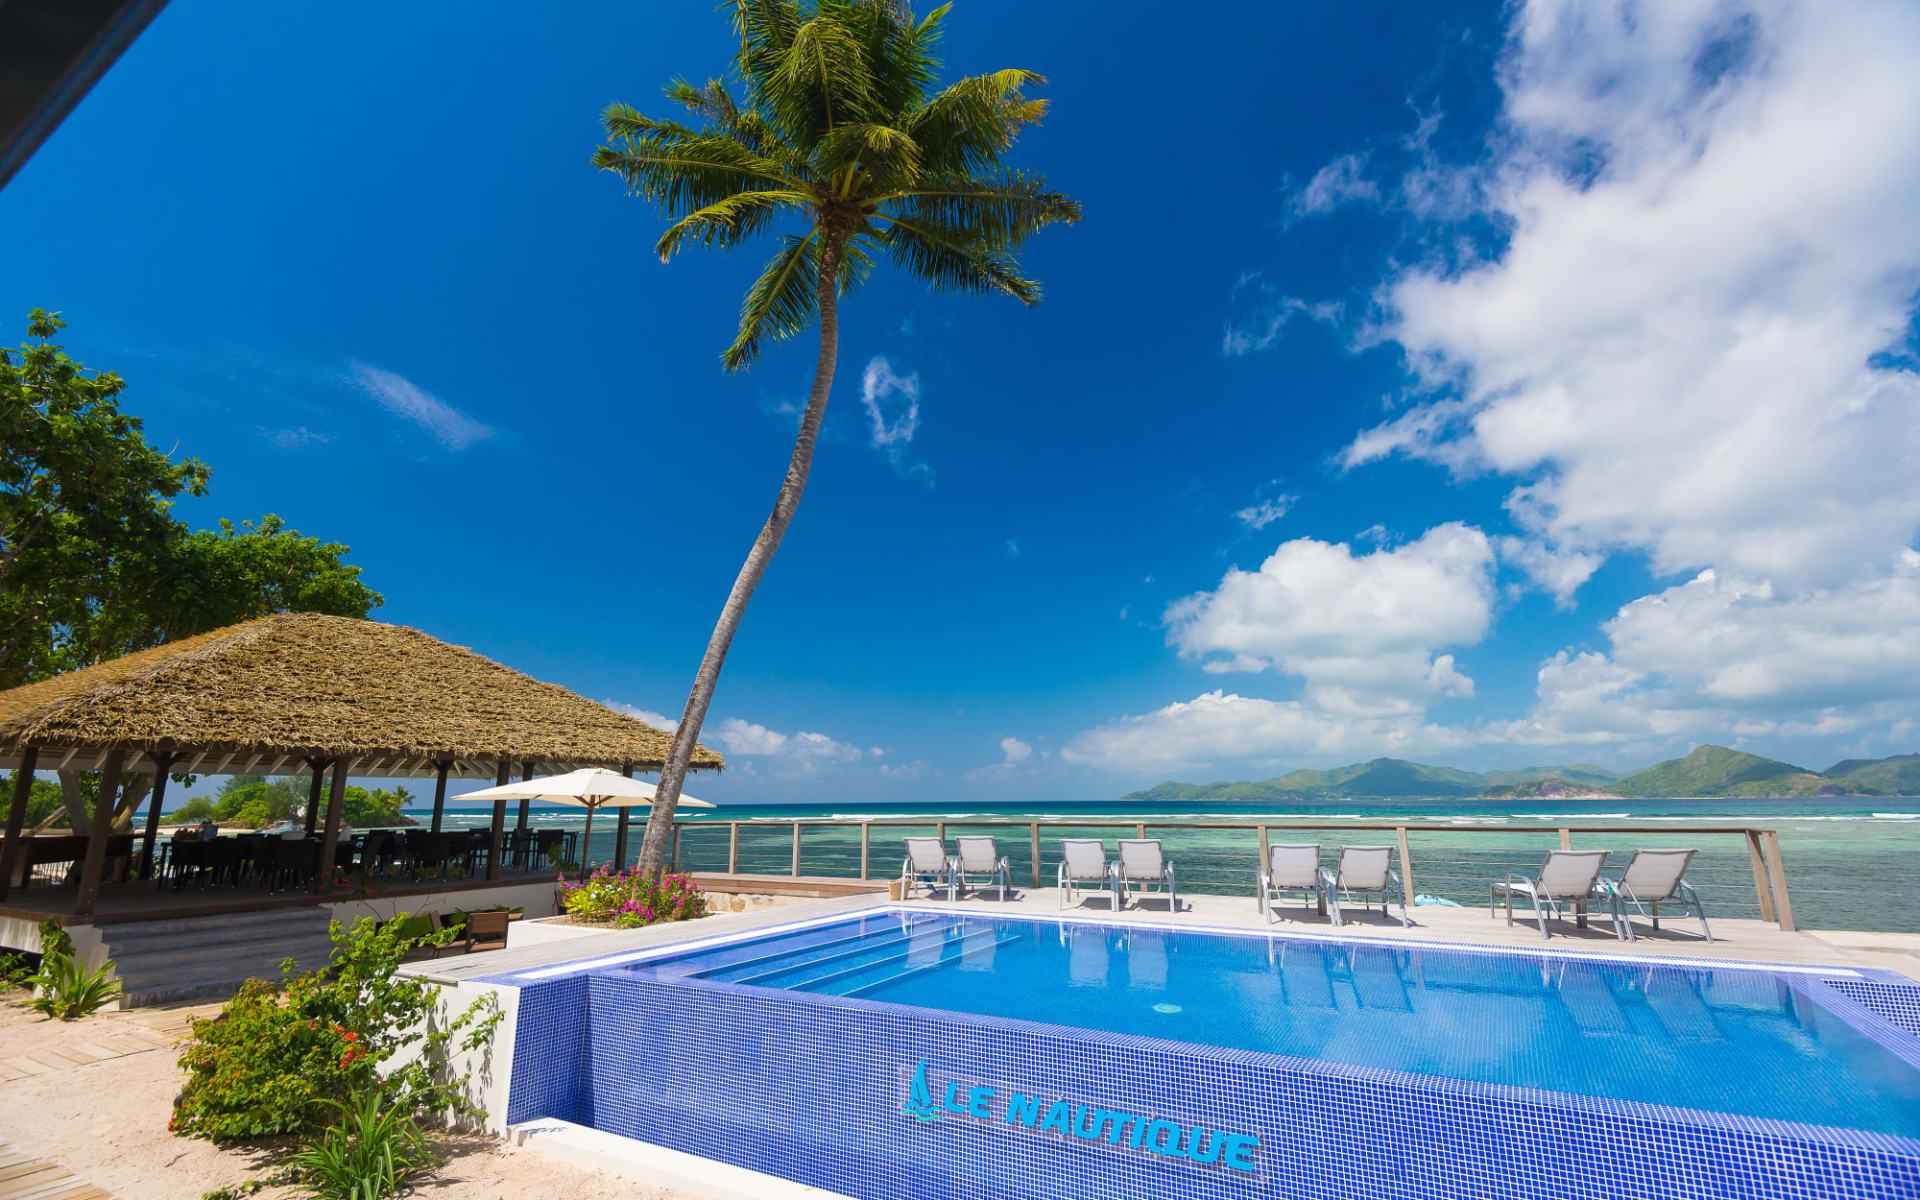 Le Nautique Luxury Waterfront Hotel in La Digue: